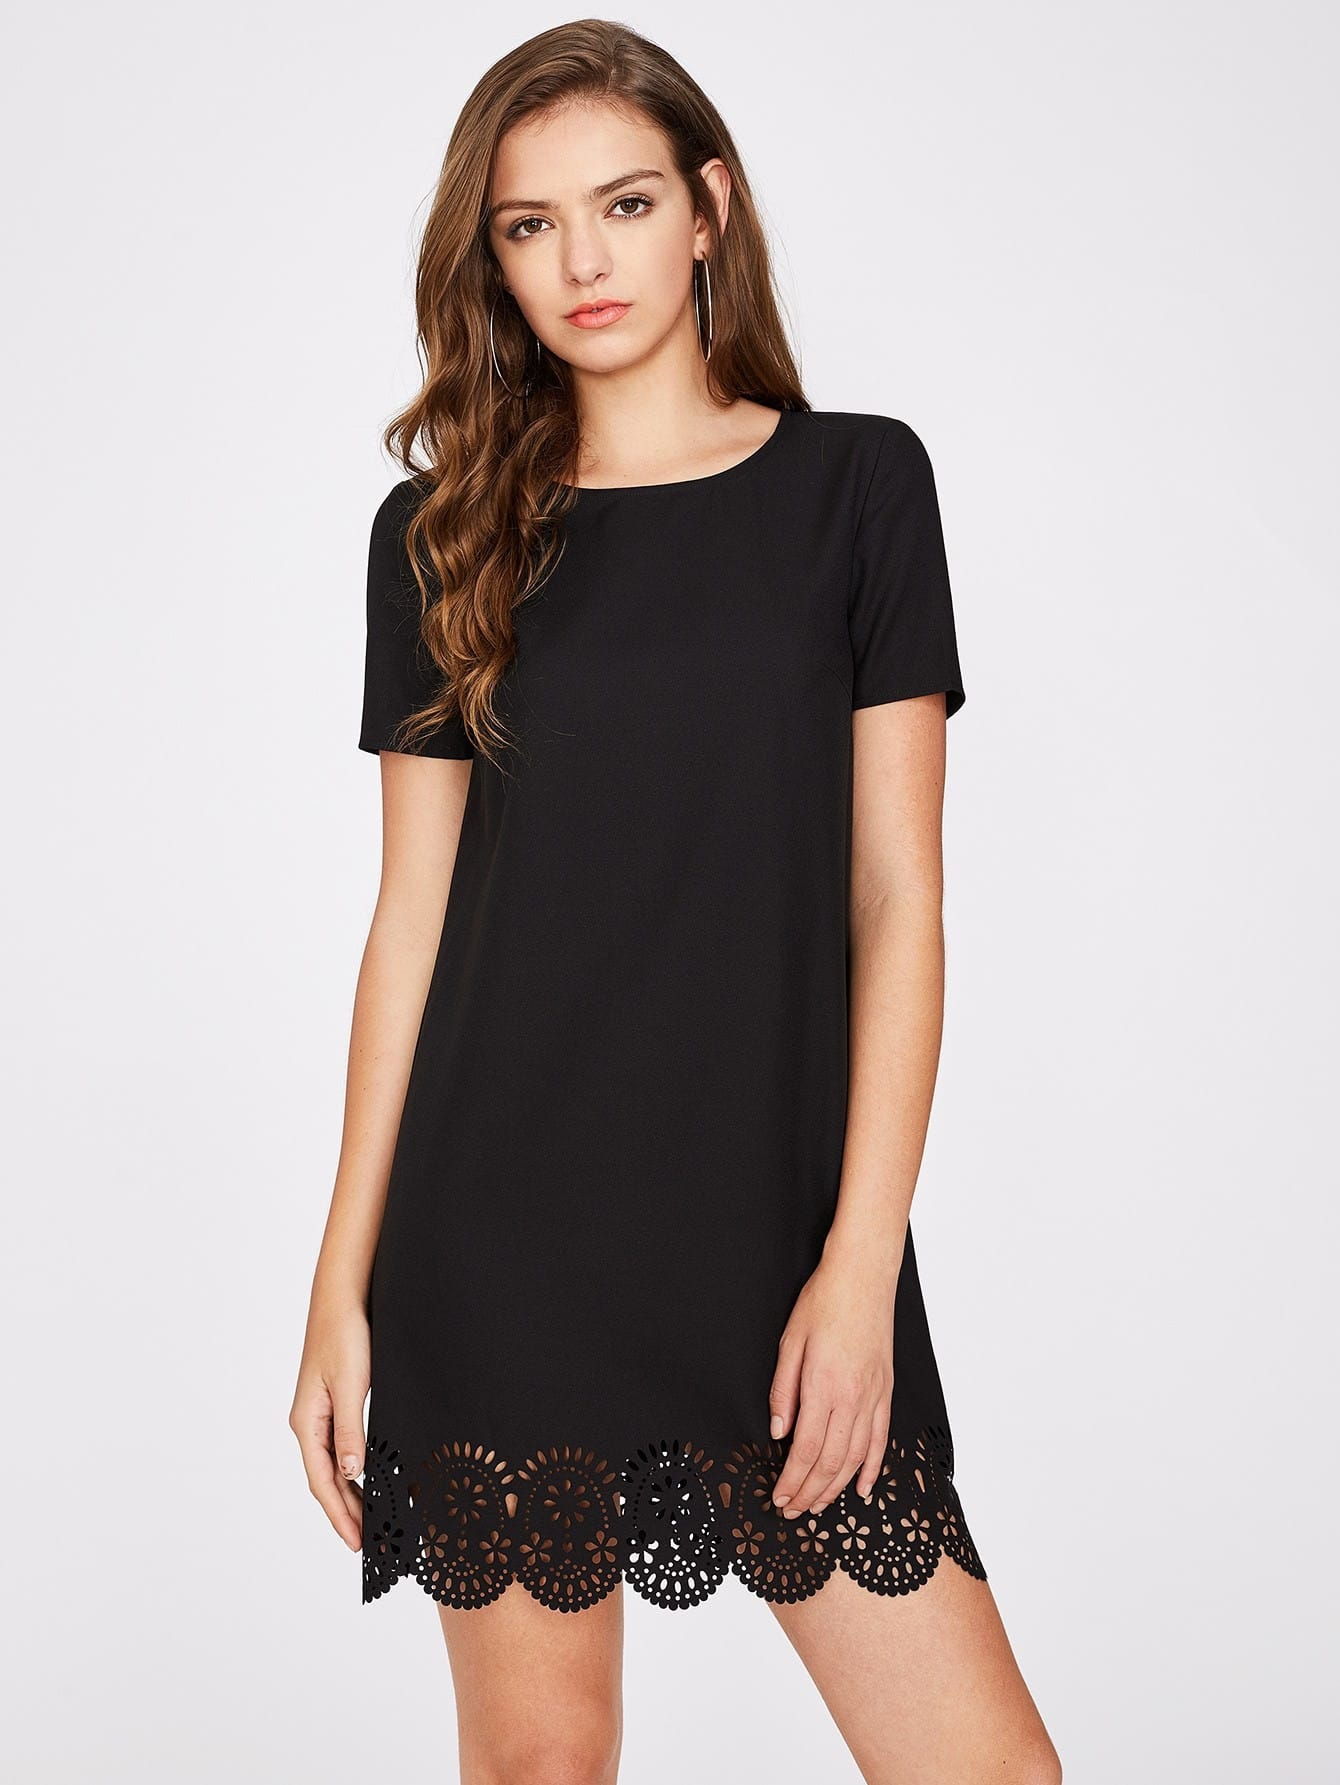 Laser Cut Scallop Hem Textured Dress batwing sleeve pocket side curved hem textured dress